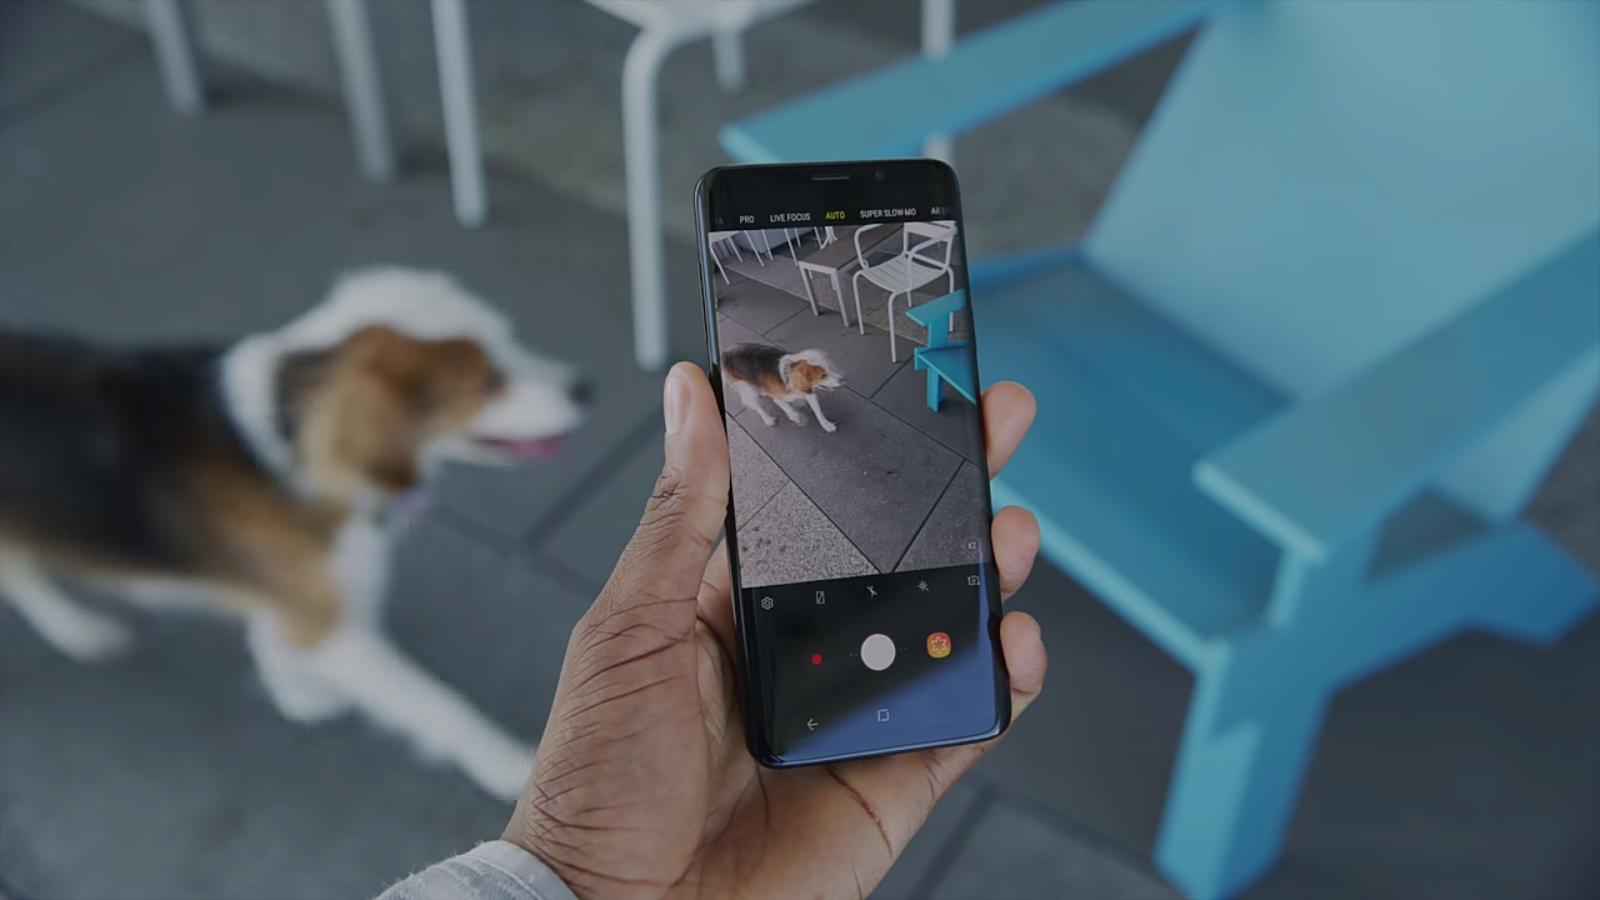 Samsung galaxy s9 camera review